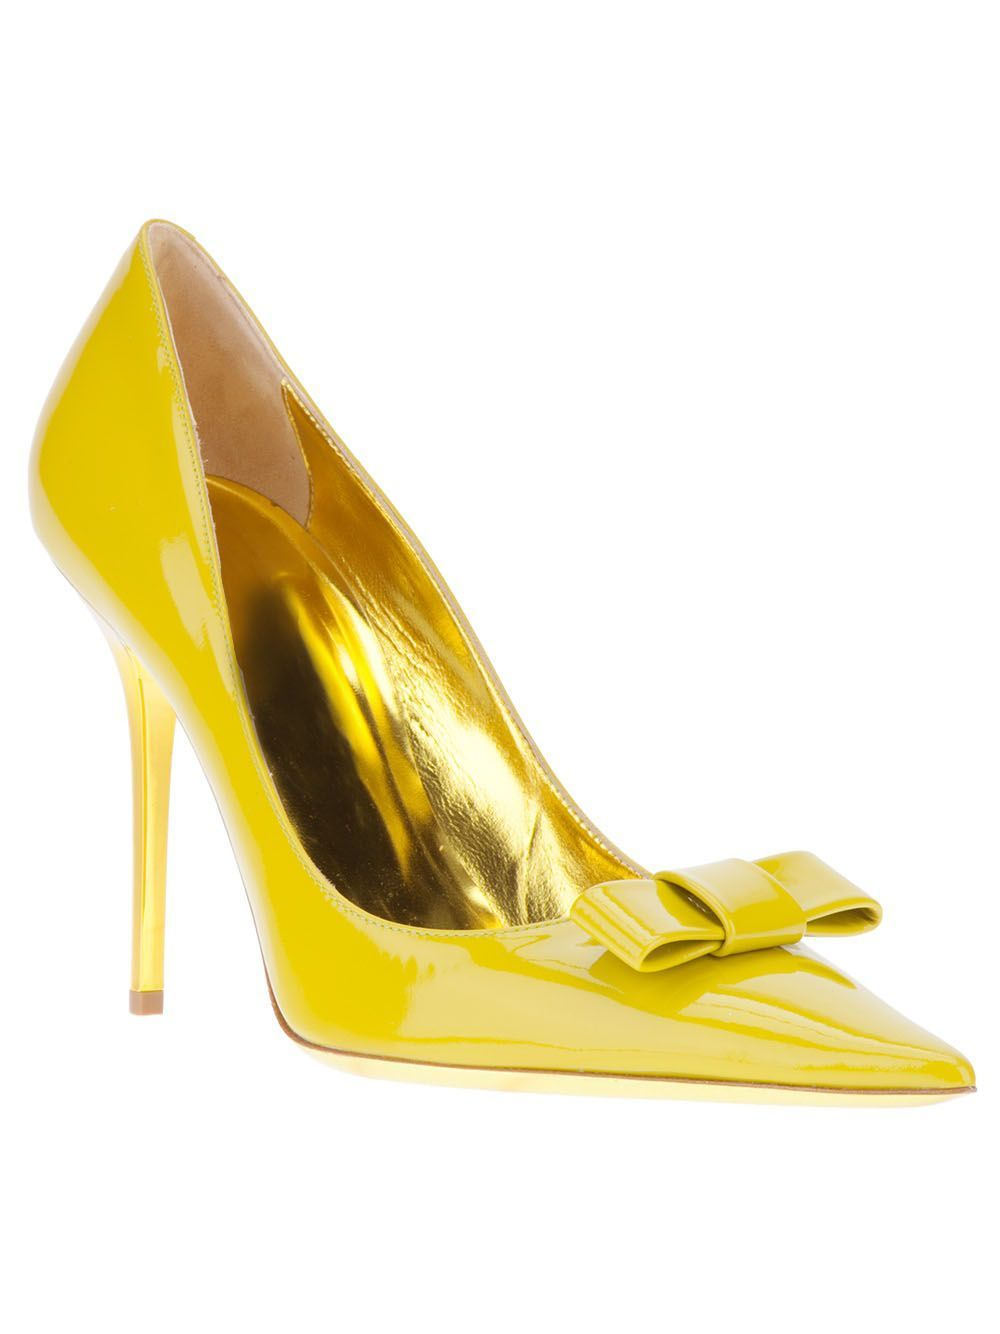 Wedding decorations yellow november 2018  Dresswe SUPPLIES Lovely Yellow Closed Toe Stiletto Heels